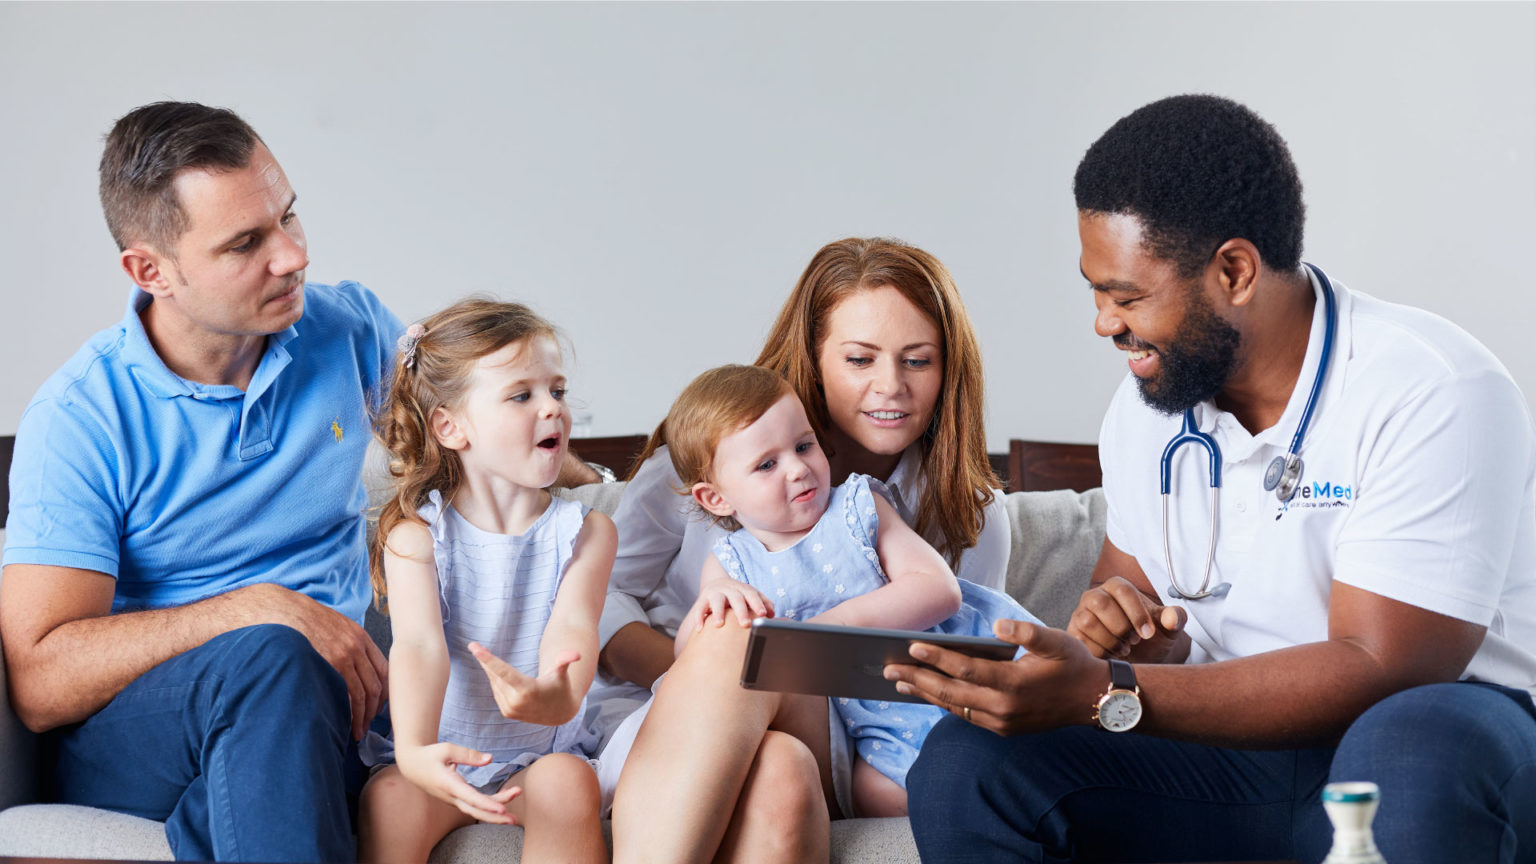 HomeMed-Homepage-medical care